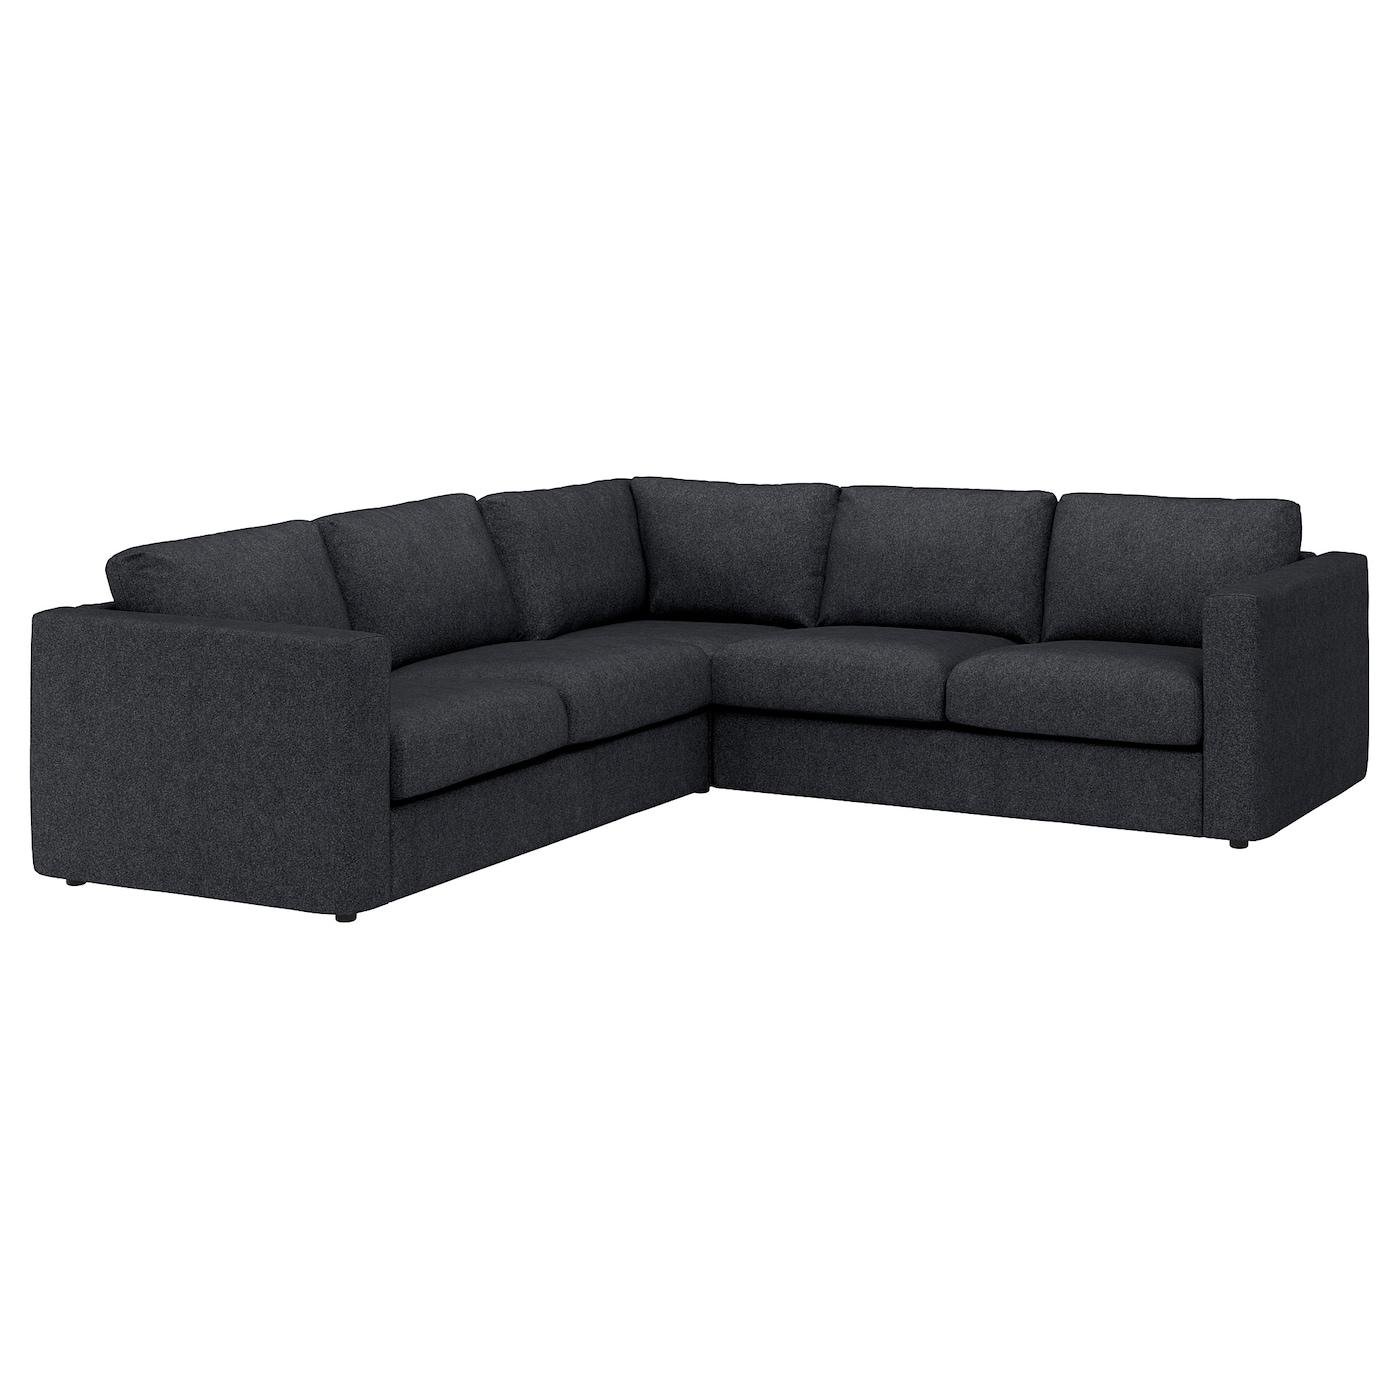 IKEA VIMLE Sofa narożna 4-osobowa, Tallmyra czarny/szary